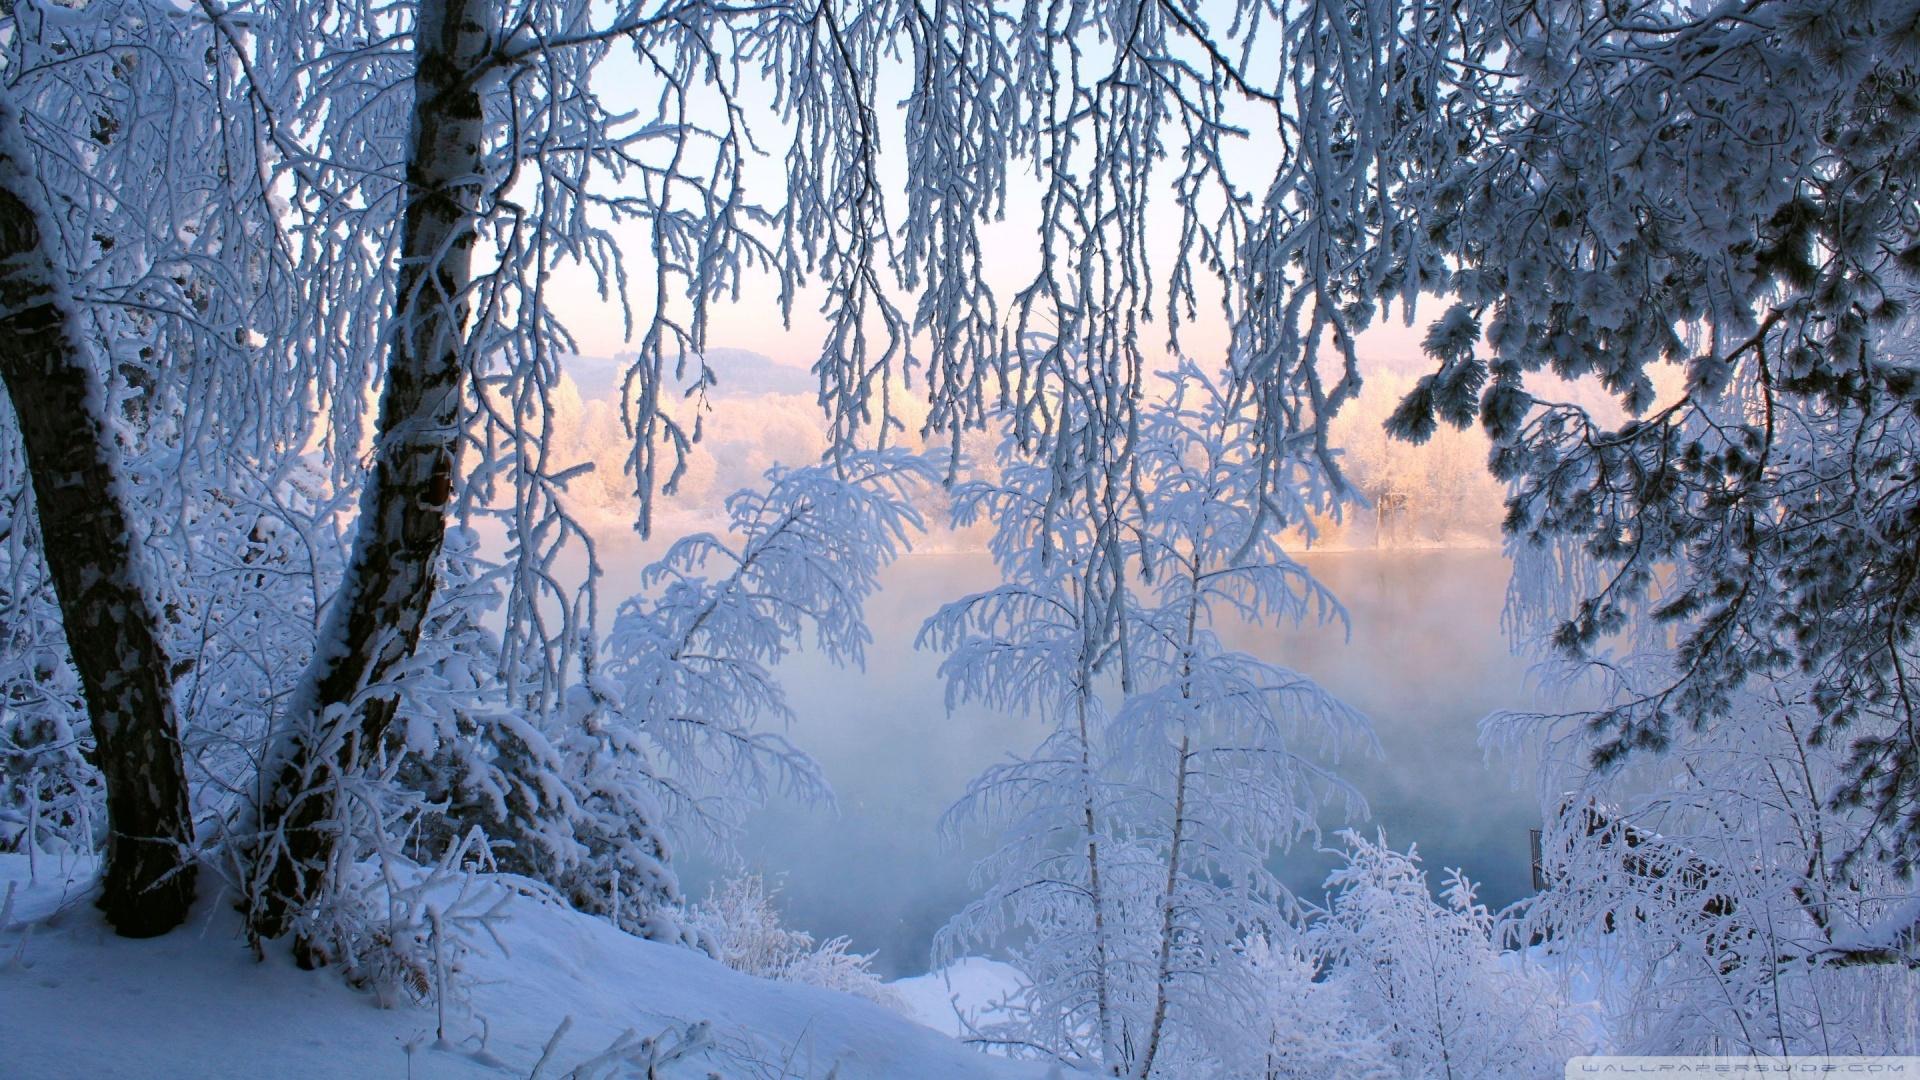 Beautiful Winter Frost Wallpaper 1920x1080 Beautiful Winter Frost 1920x1080